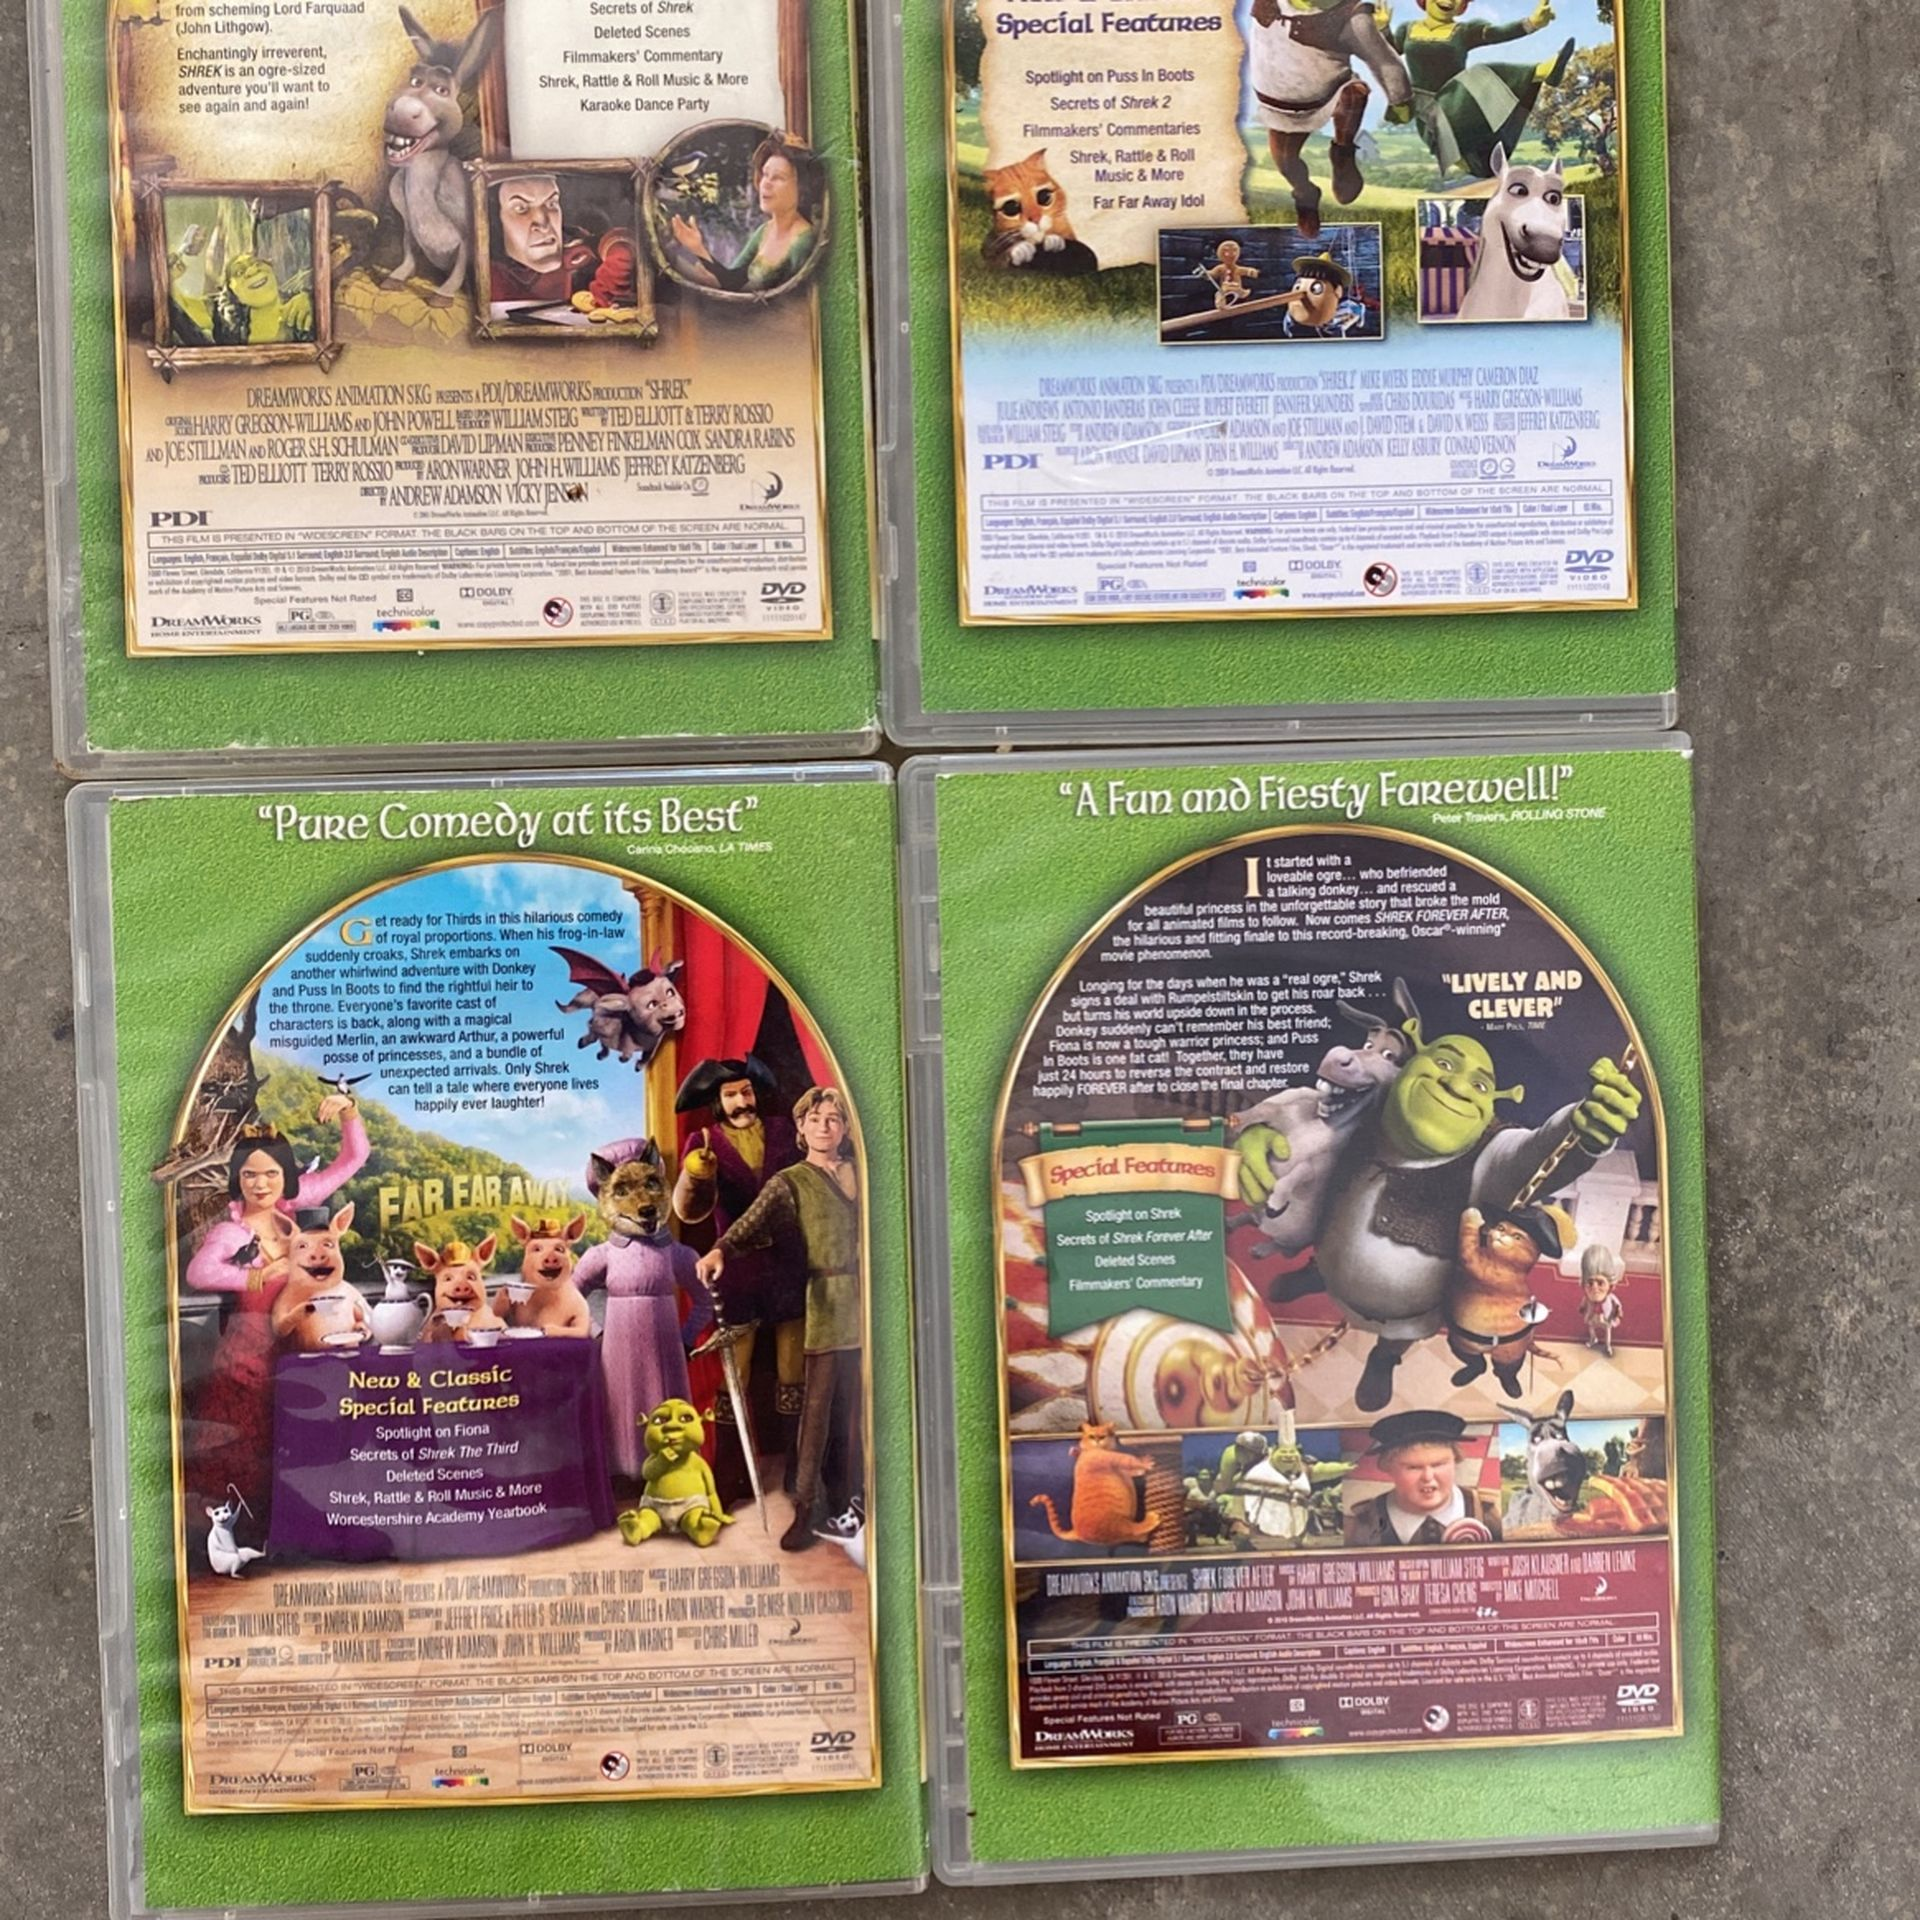 Shrek Collection Of Movies Classics Original